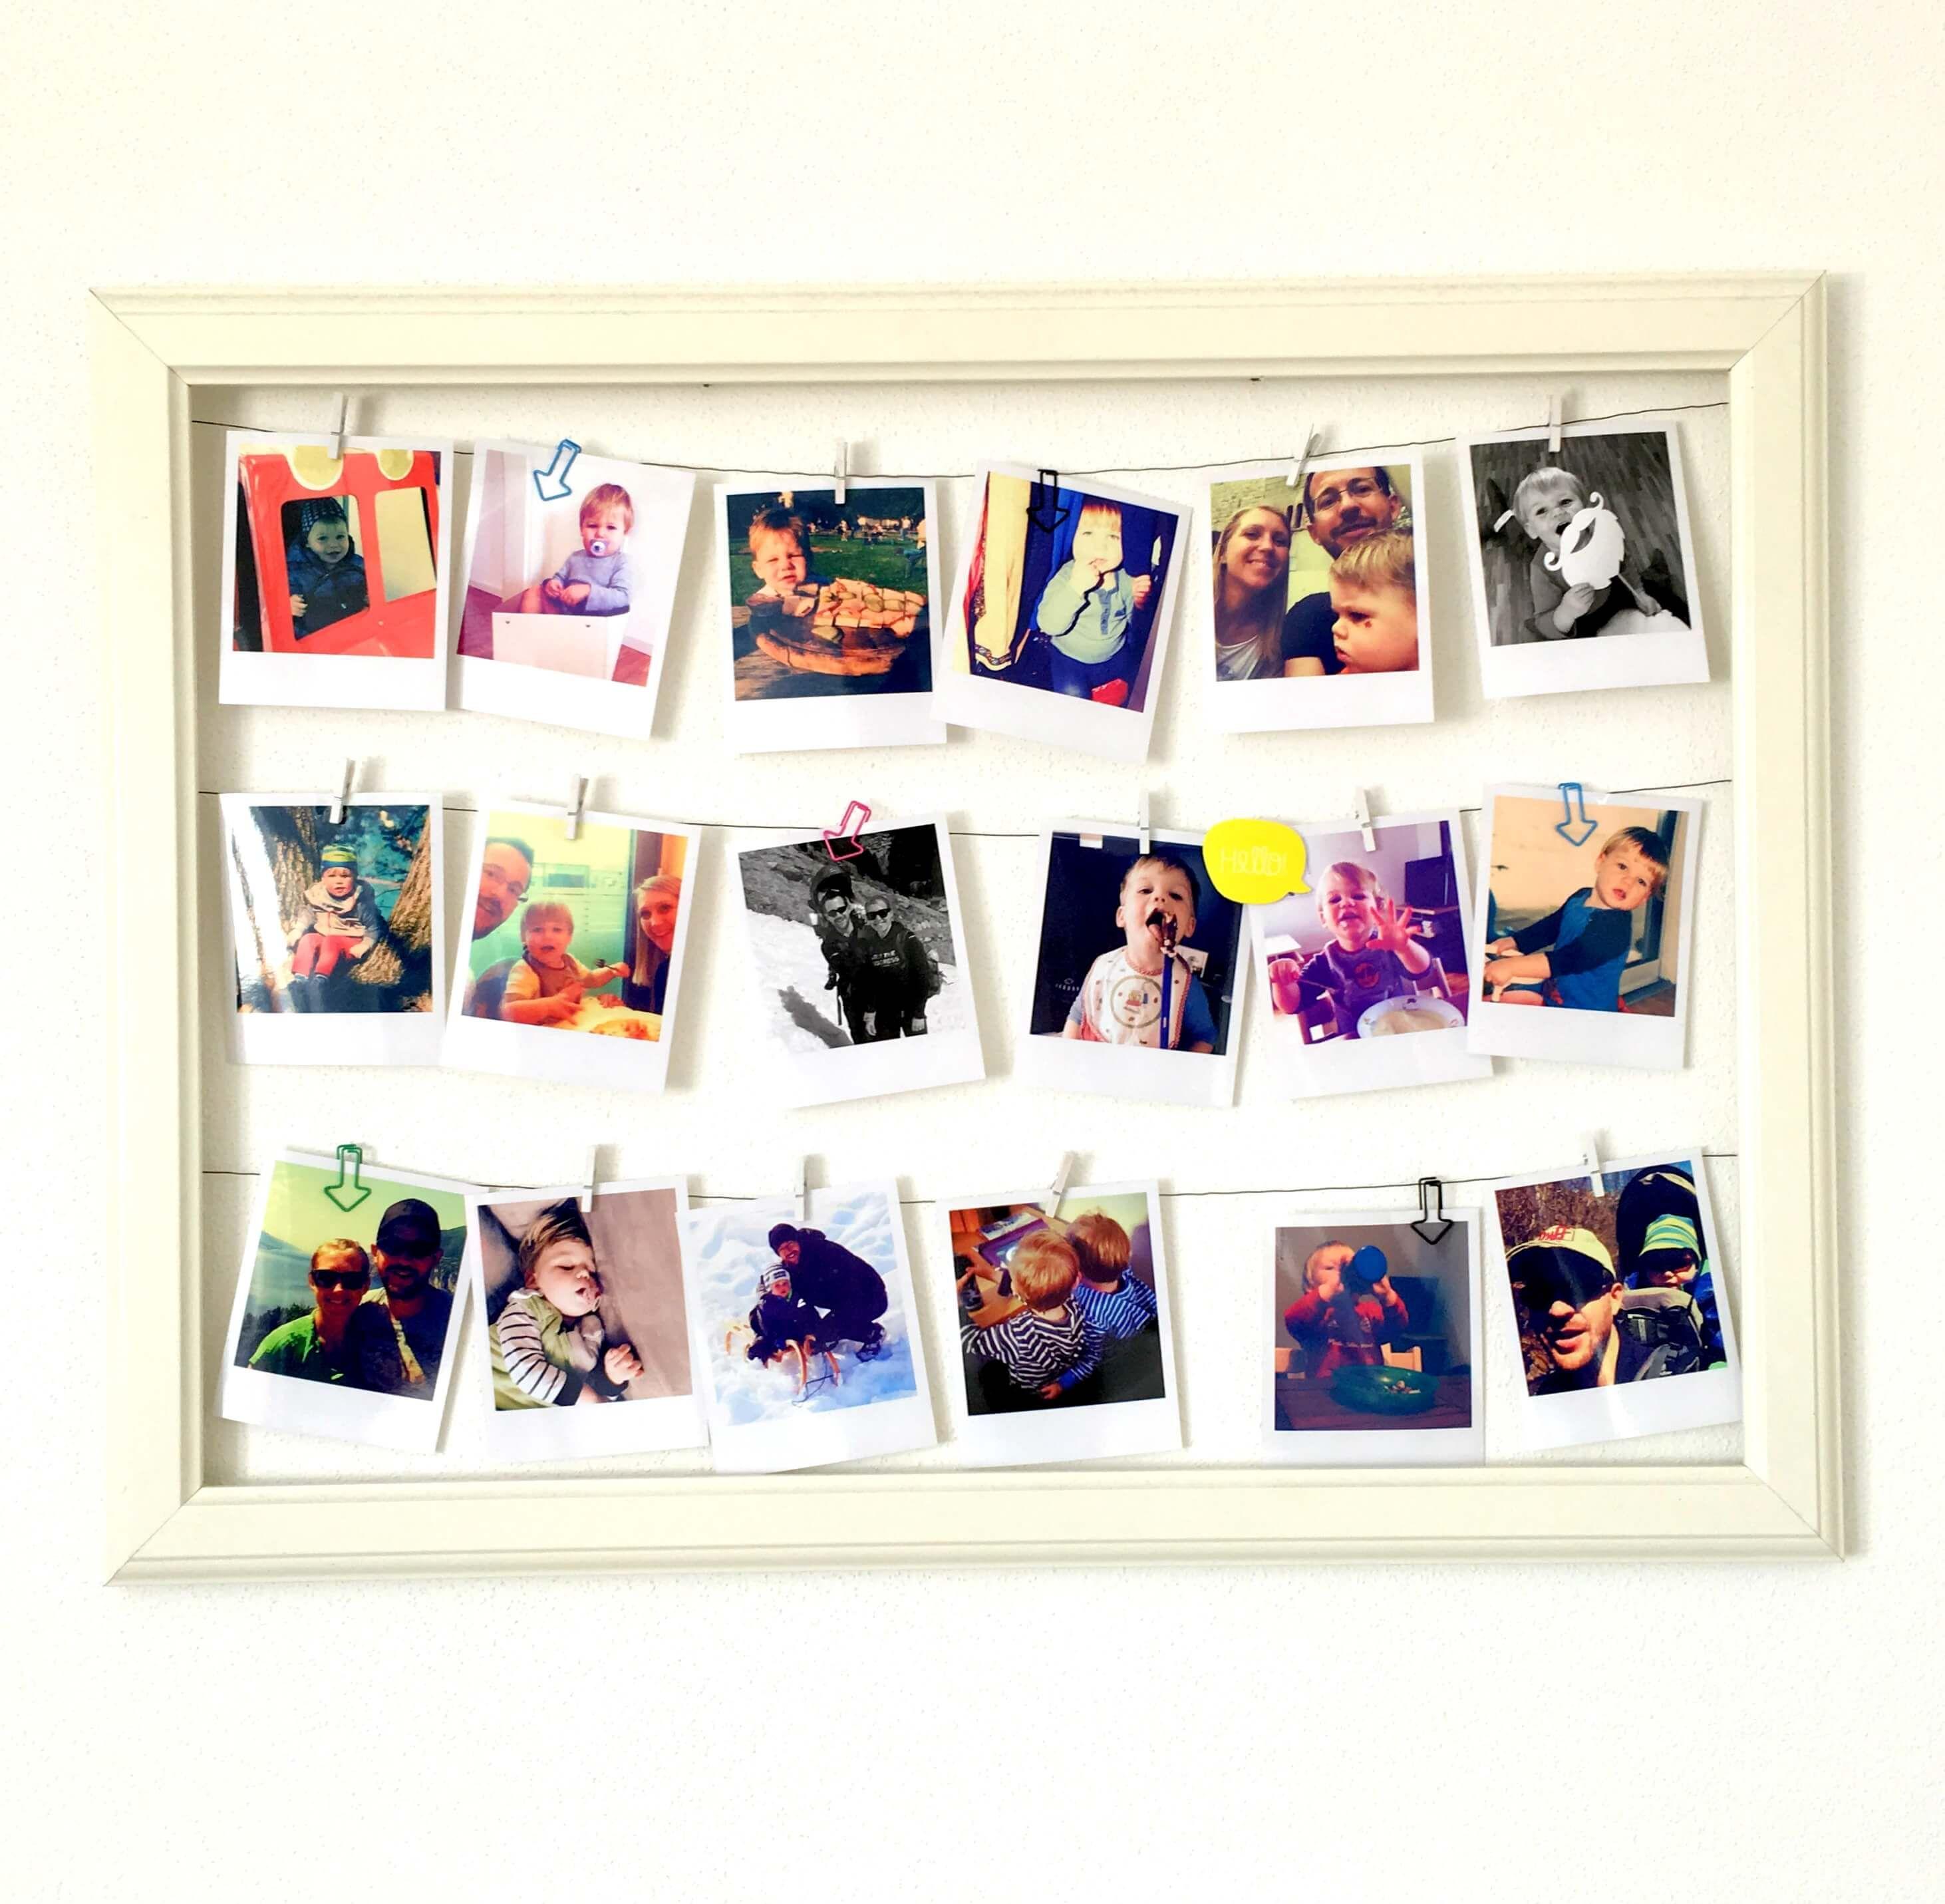 Bilderrahmen / Memoboard mit Polaroids | Pinterest | Picture walls ...